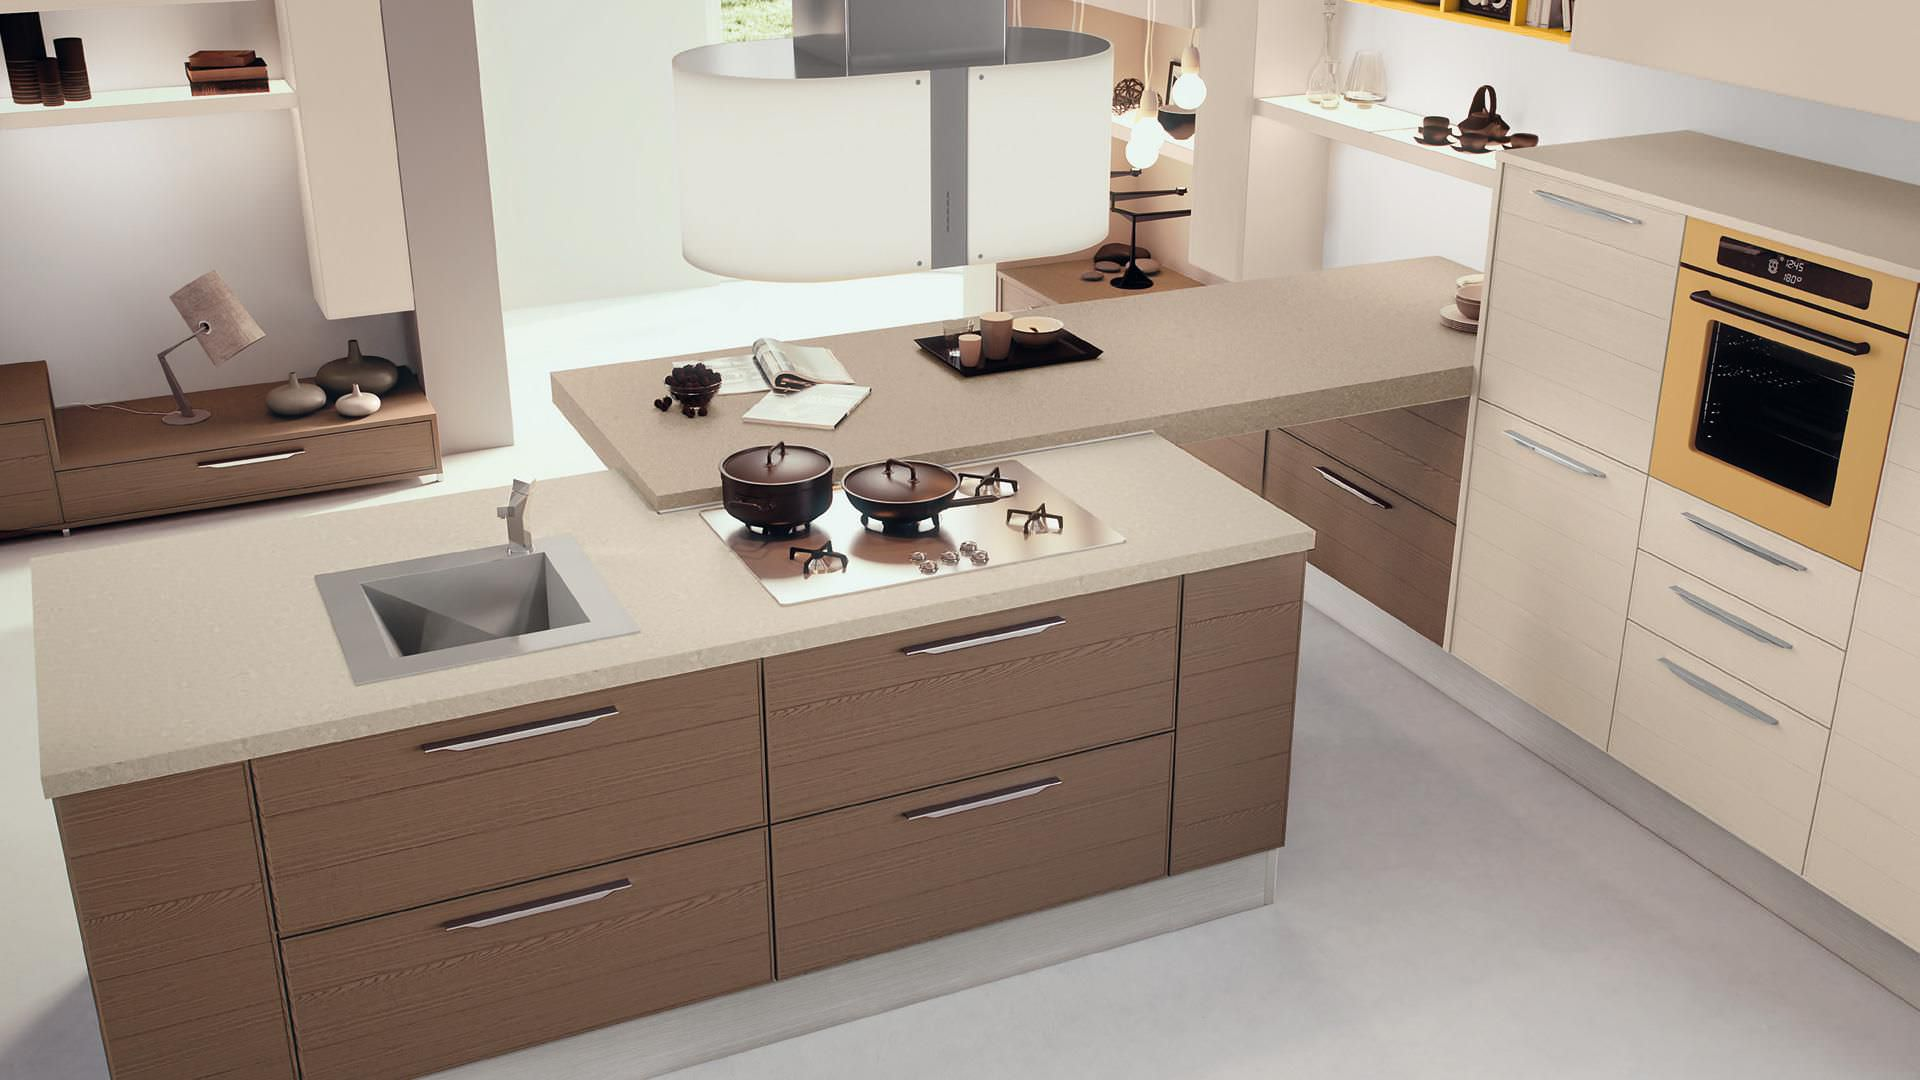 Cucina moderna / impiallacciata in legno / con isola - ADELE ...